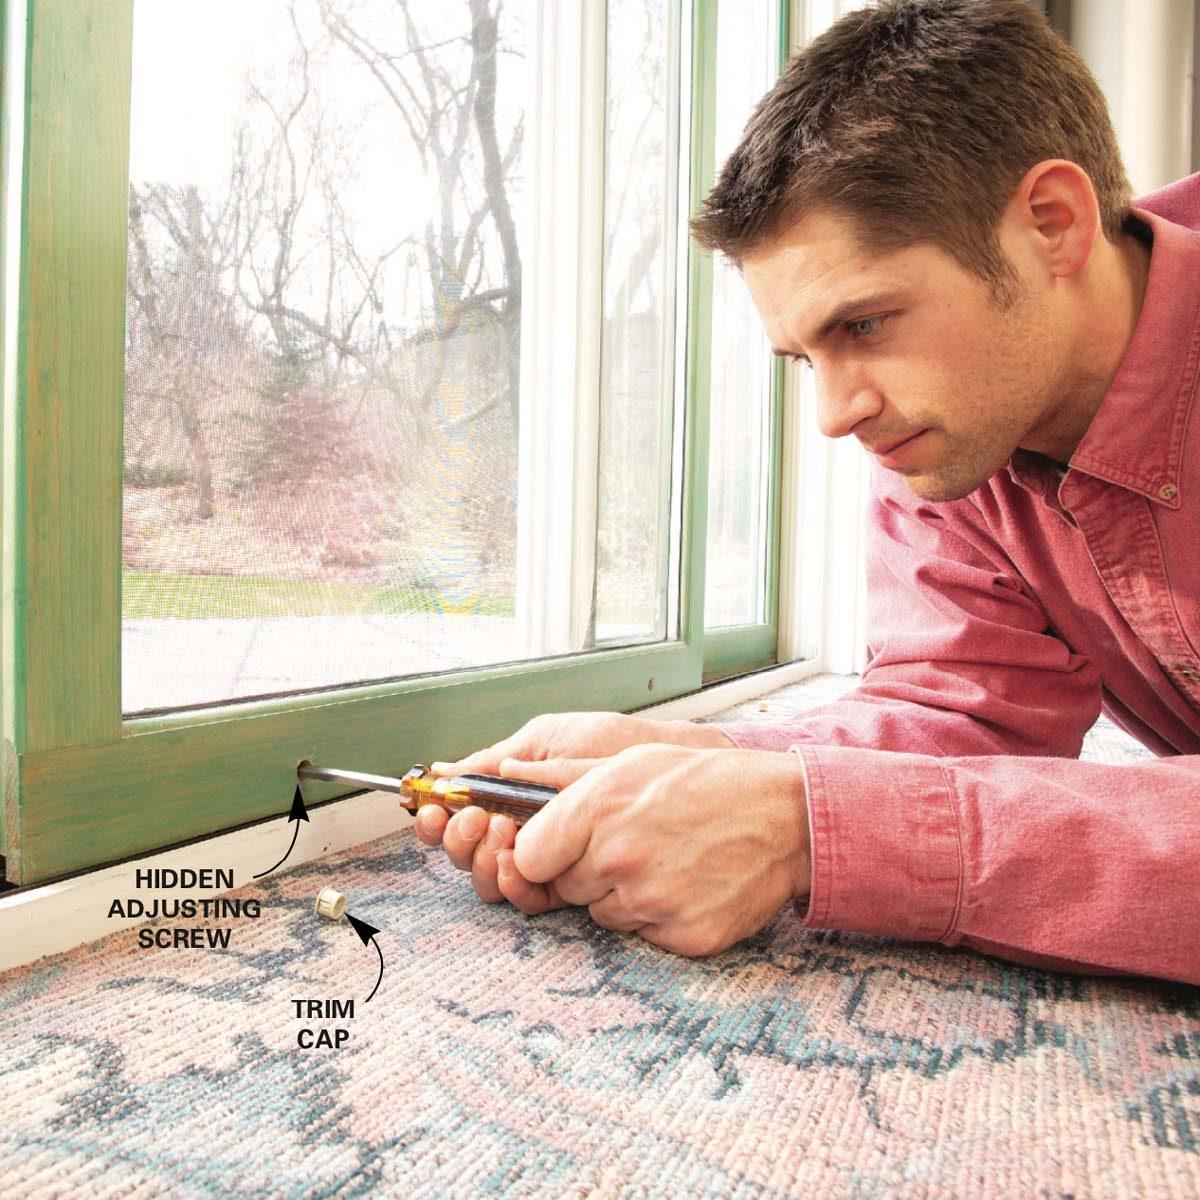 How To Repair A Sliding Door Diy The Family Handyman